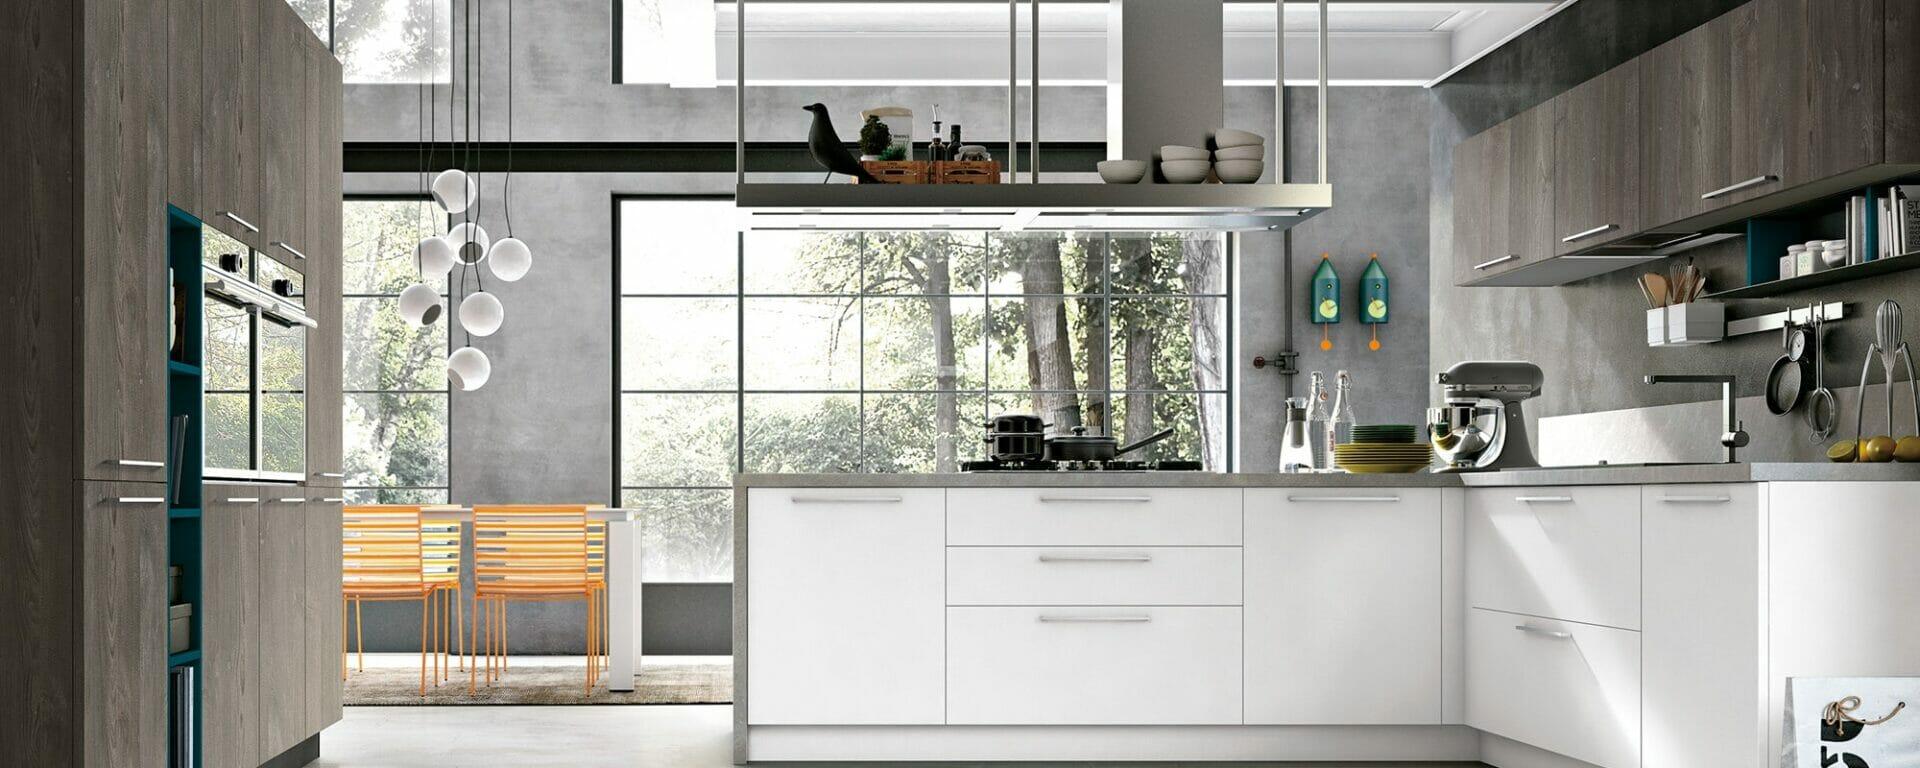 Le cucine - Scopri i modelli di cucine più adatti alle tue esigenze ...